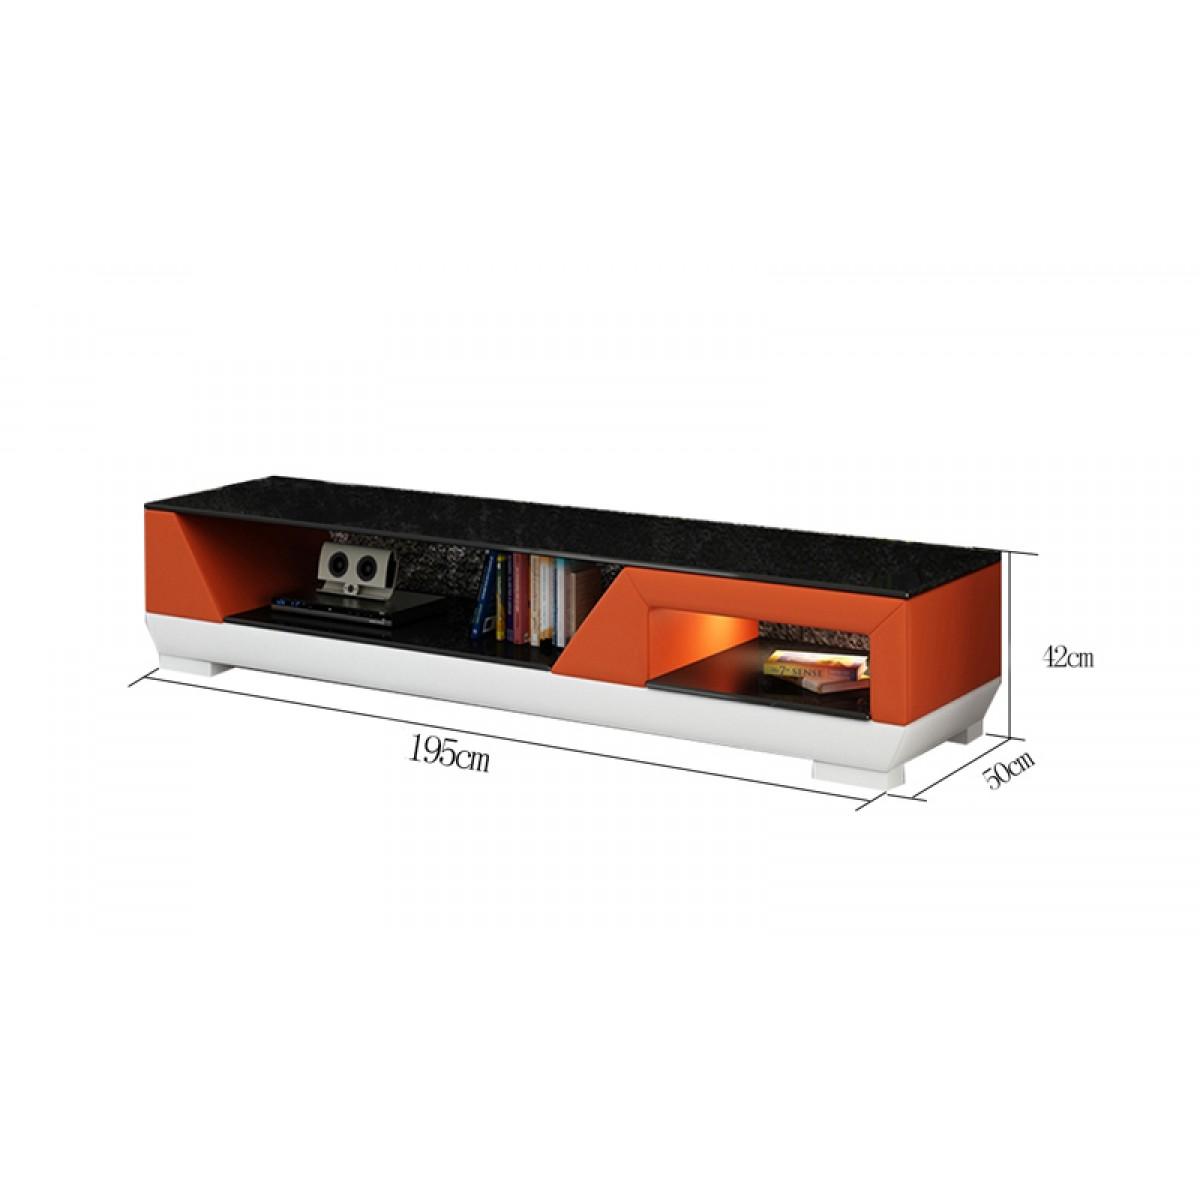 Meuble tv design personnalisable klin pu aspect cuir pop - Meuble personnalisable ...